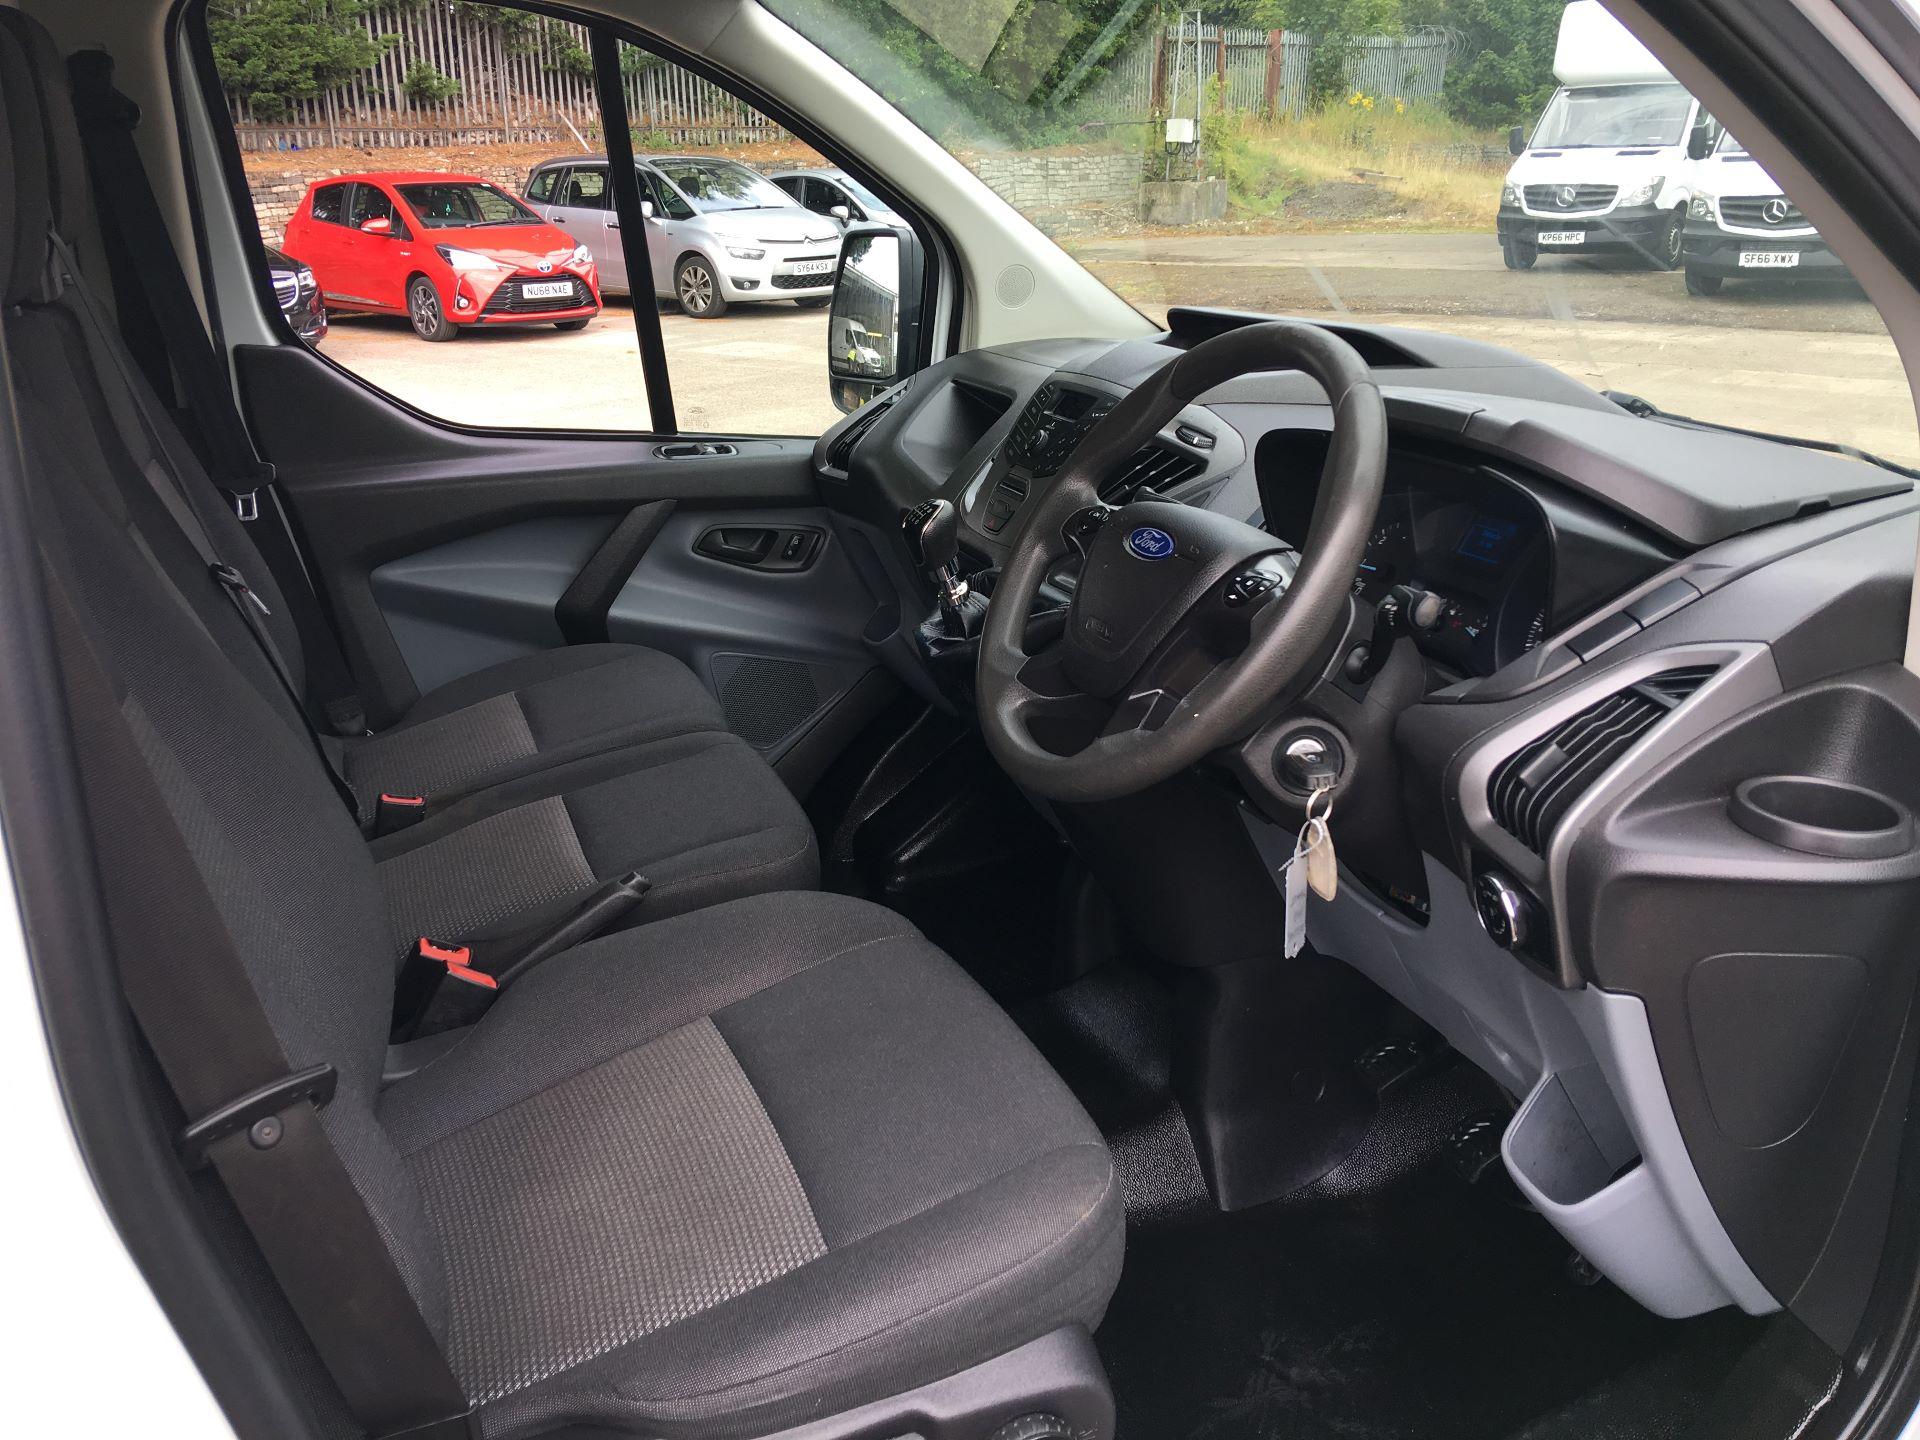 2016 Ford Transit Custom 290 L1 DIESEL FWD 2.0 TDCI 105PS HIGH ROOF VAN EURO 6 (SK66VKG) Image 2